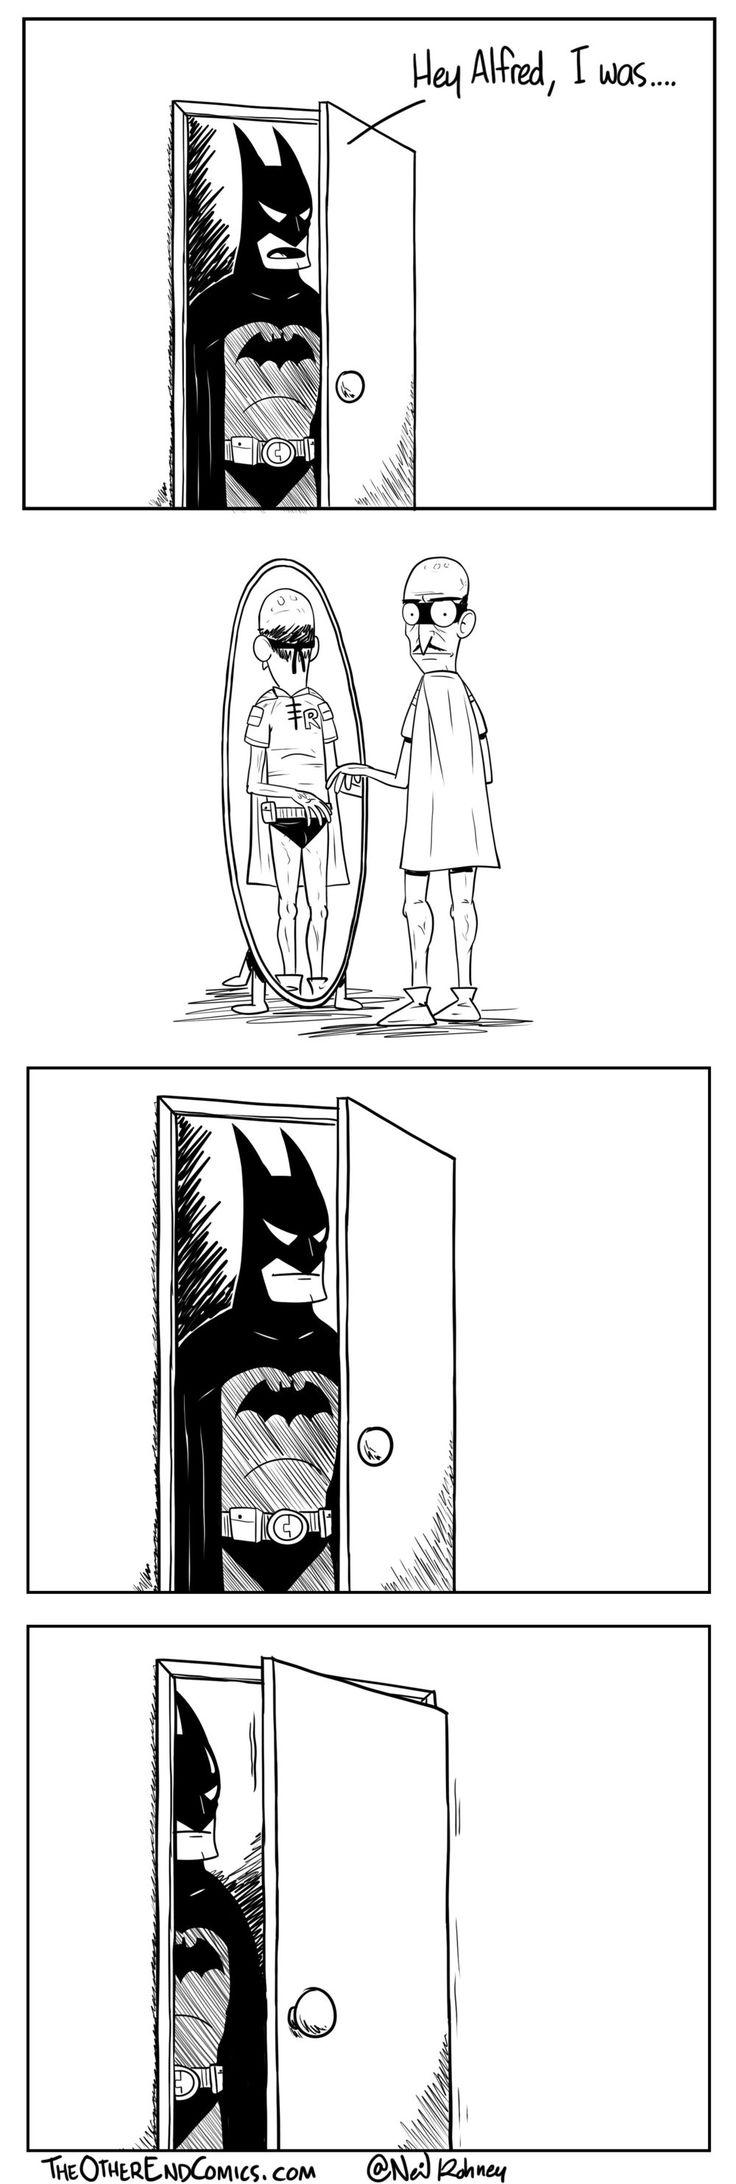 Fashion of the bat an extremely thorough examination of batman s - Batman Comic Strip Alfred S Secret Shame